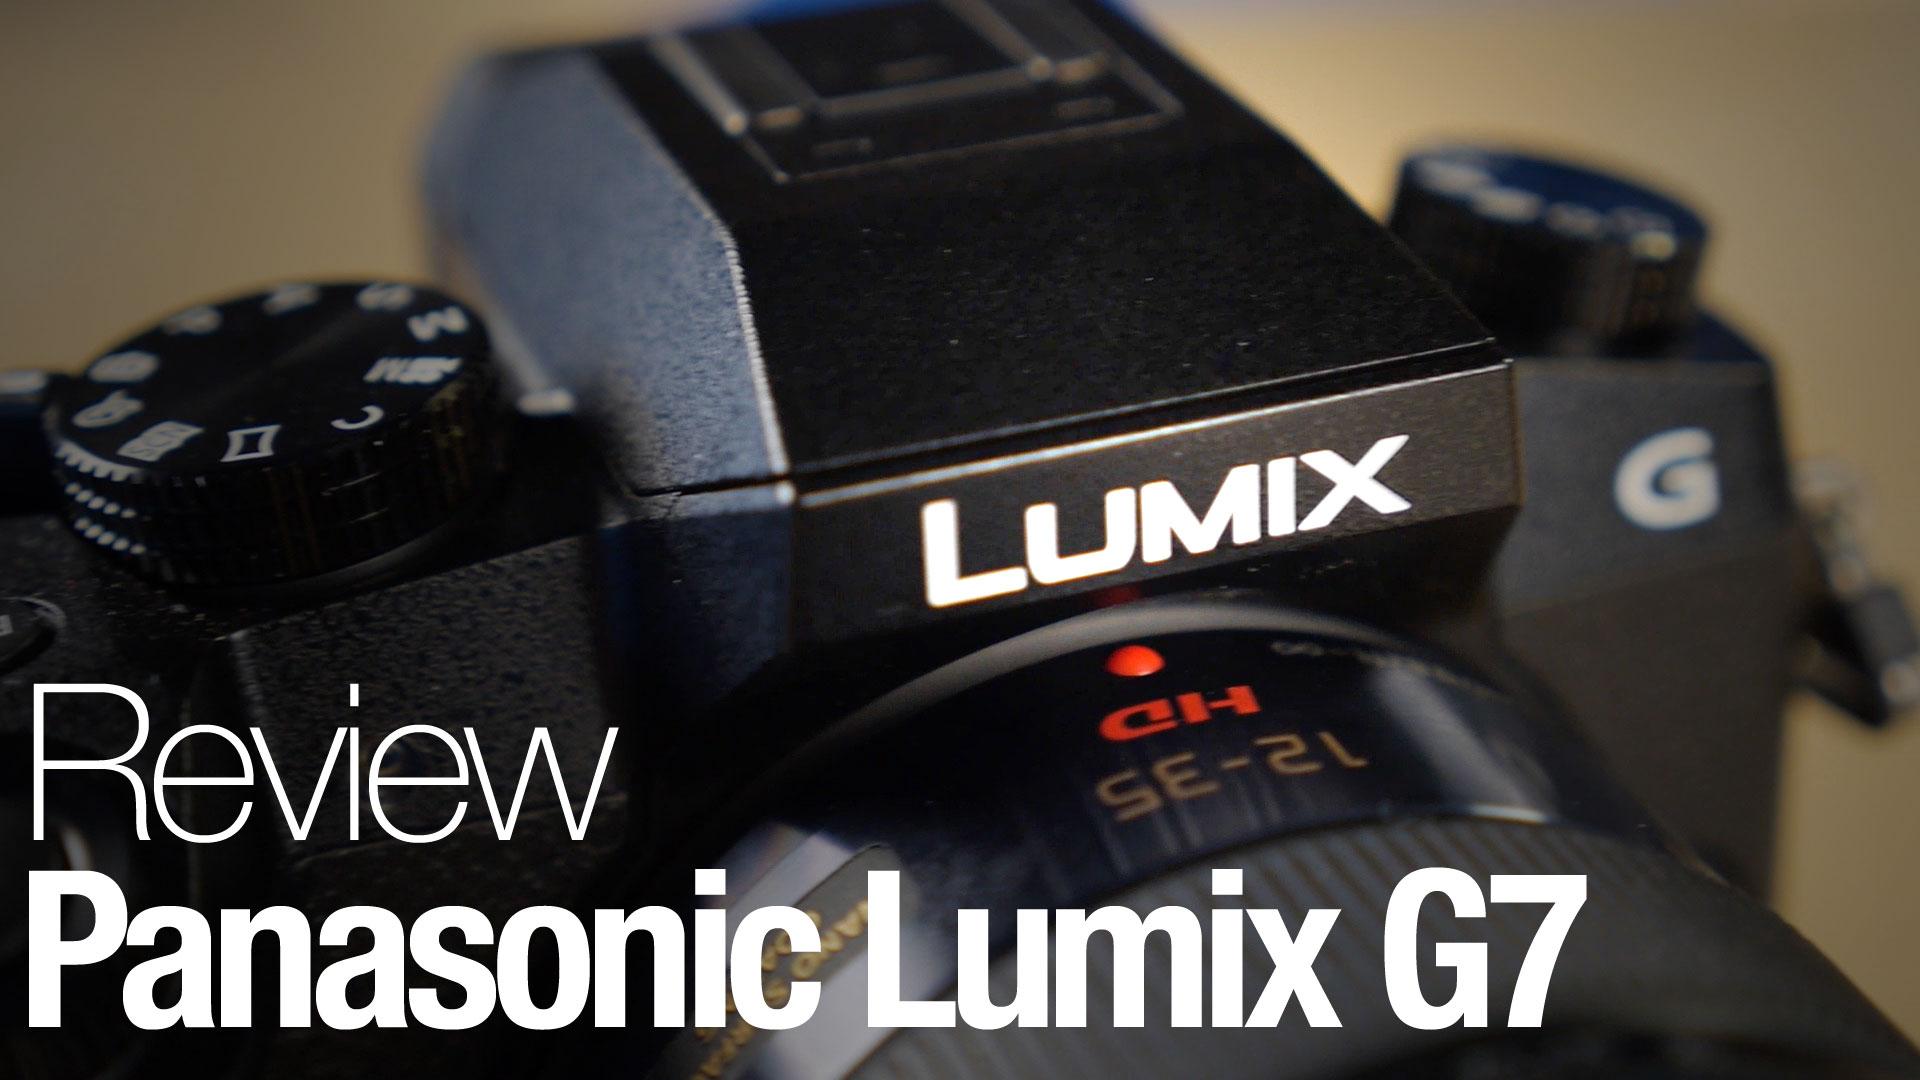 Panasonic Lumix Dmc Gx85 Digital Camera Review Cameras Gx85k Lensa 12 32mm Kamera